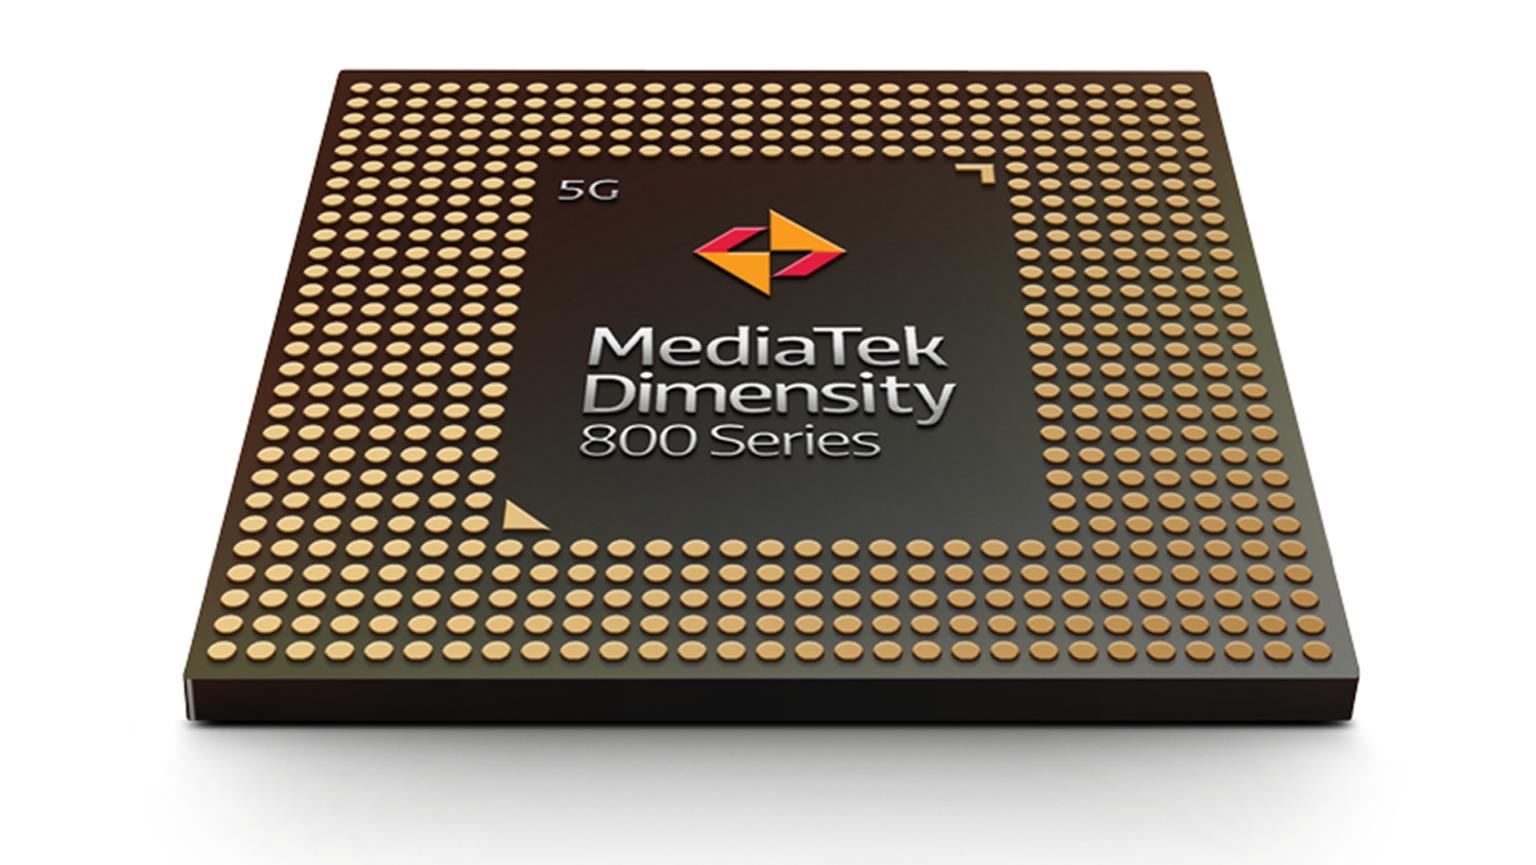 Dimensity 800 processor